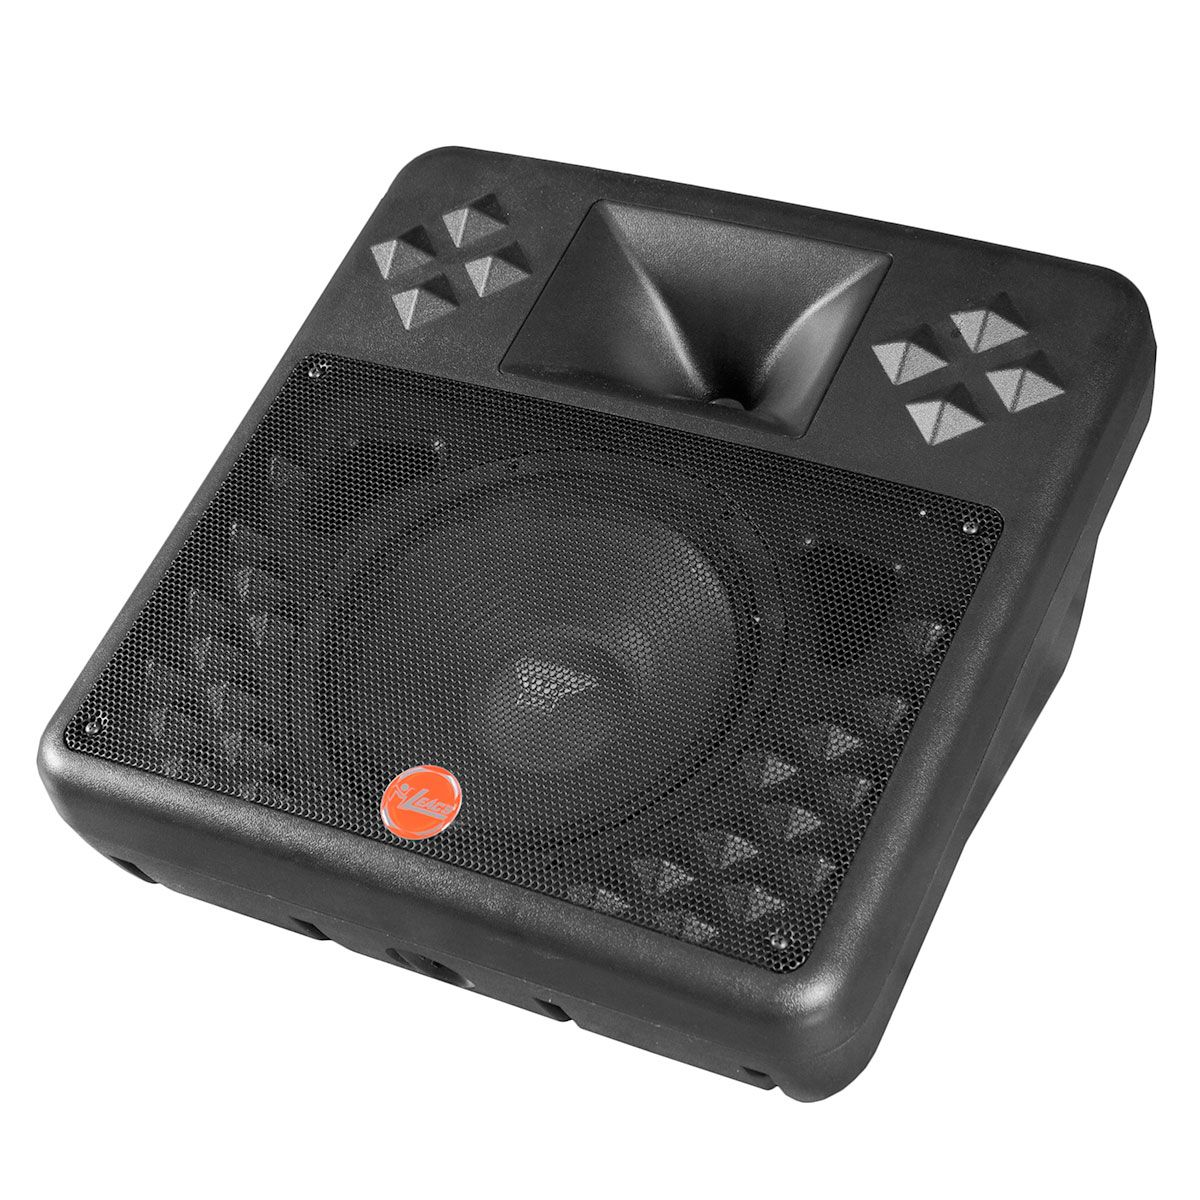 Caixa Passiva Fal 10 Pol 150W c/ Suporte - It Cinema Leacs